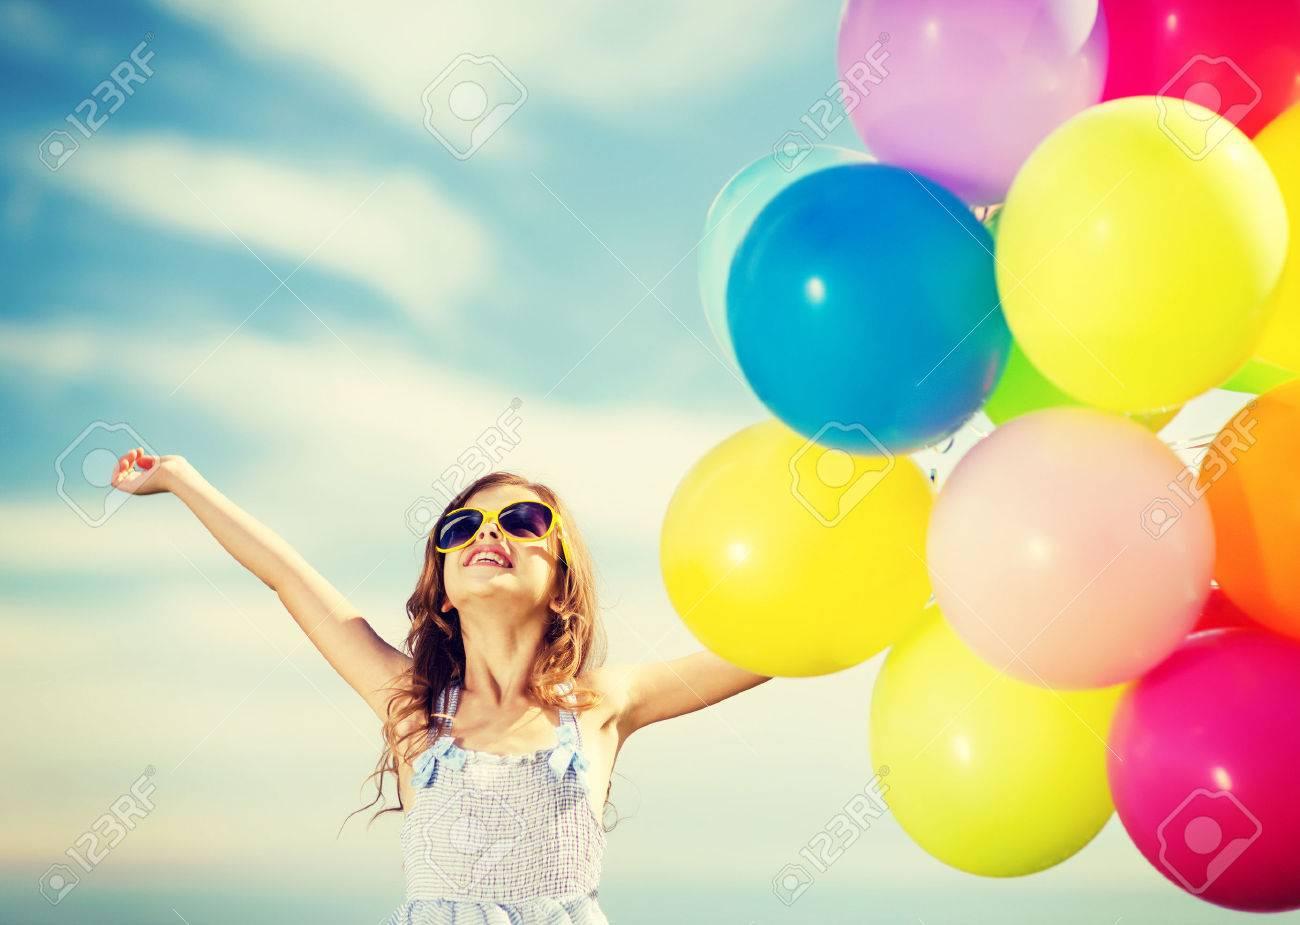 Happy Girl Colorful Balloons Meadows Concept Stock Photo 524565691 ...